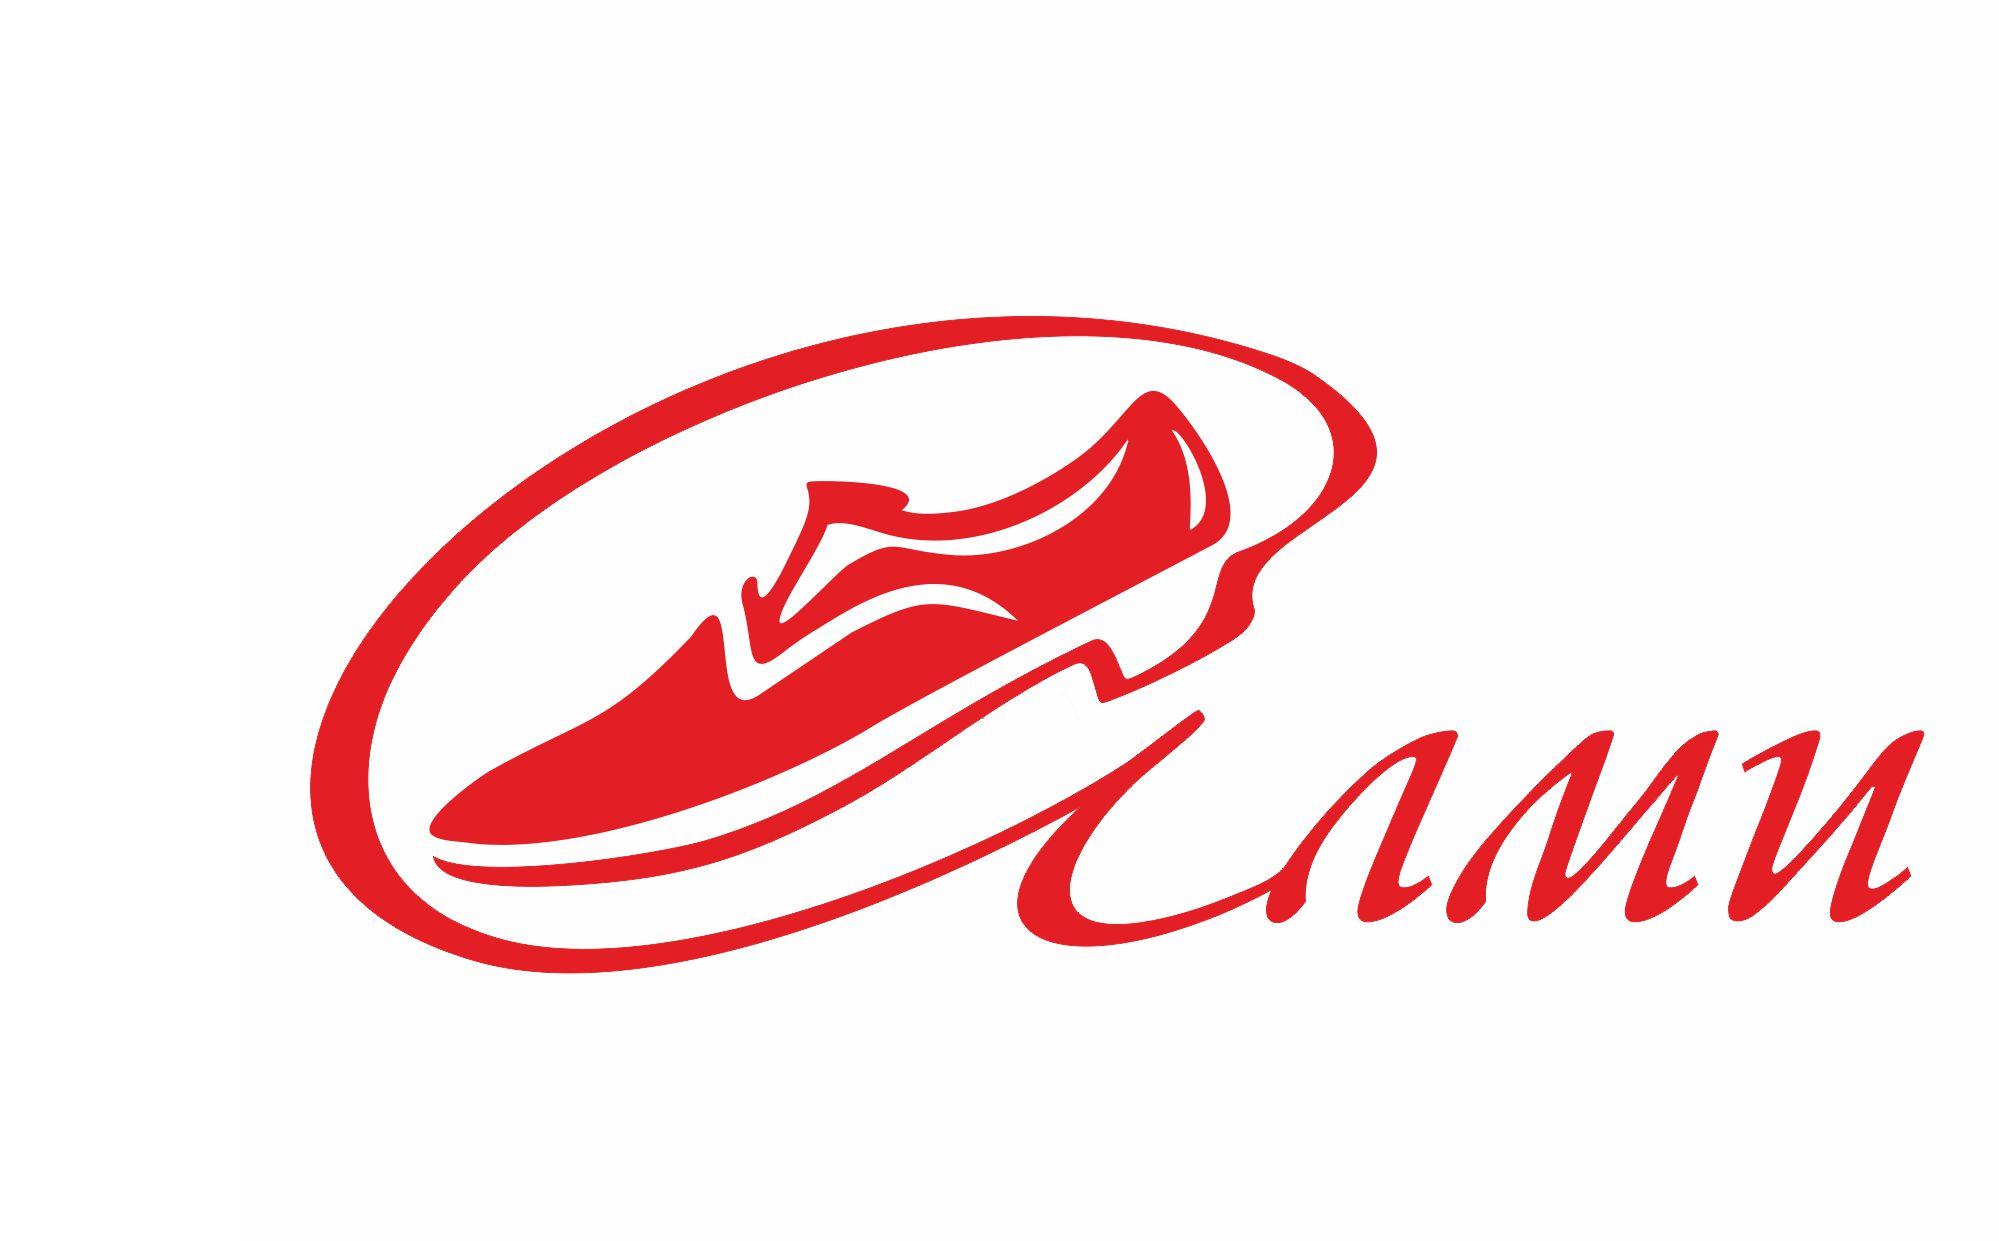 Дизайн логотипа обувной марки Алми фото f_83359d9cbf25ded0.jpg